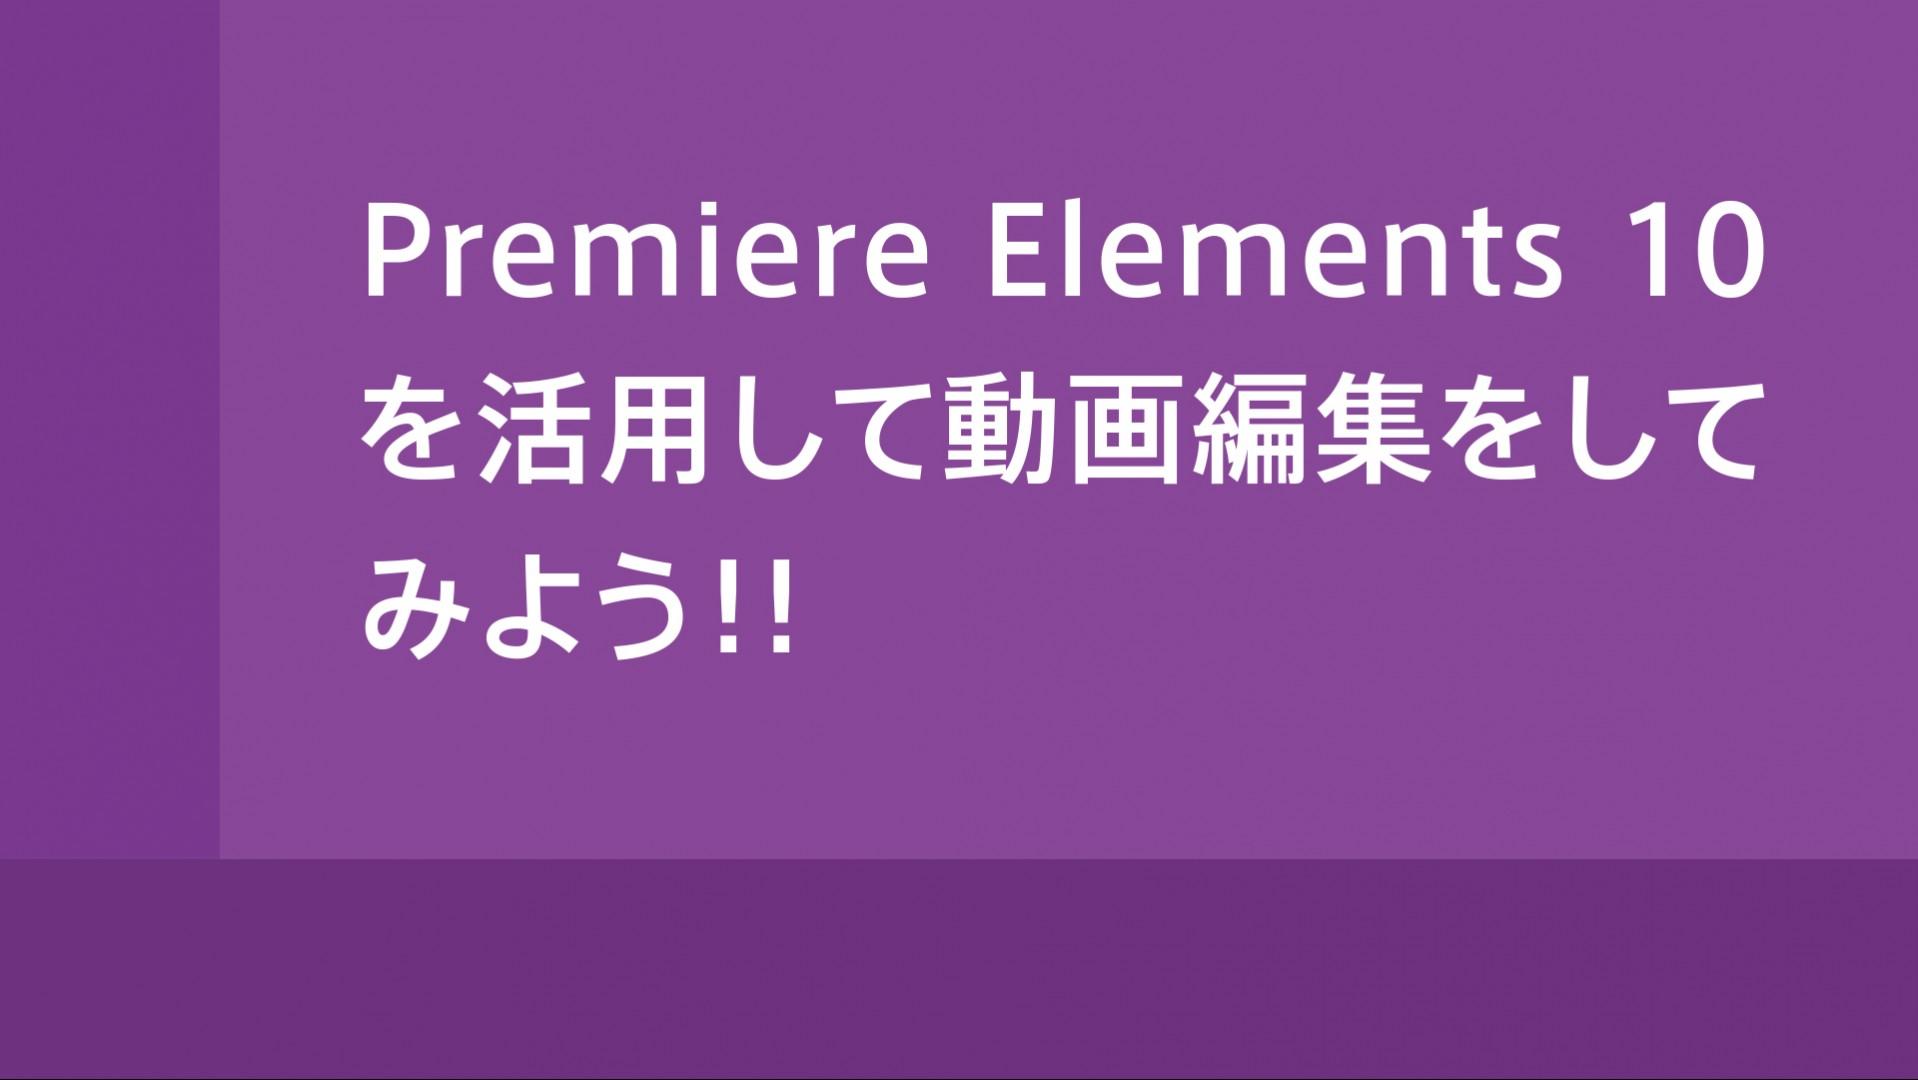 Premiere Elements 10 タイムライン上でのクリップの移動